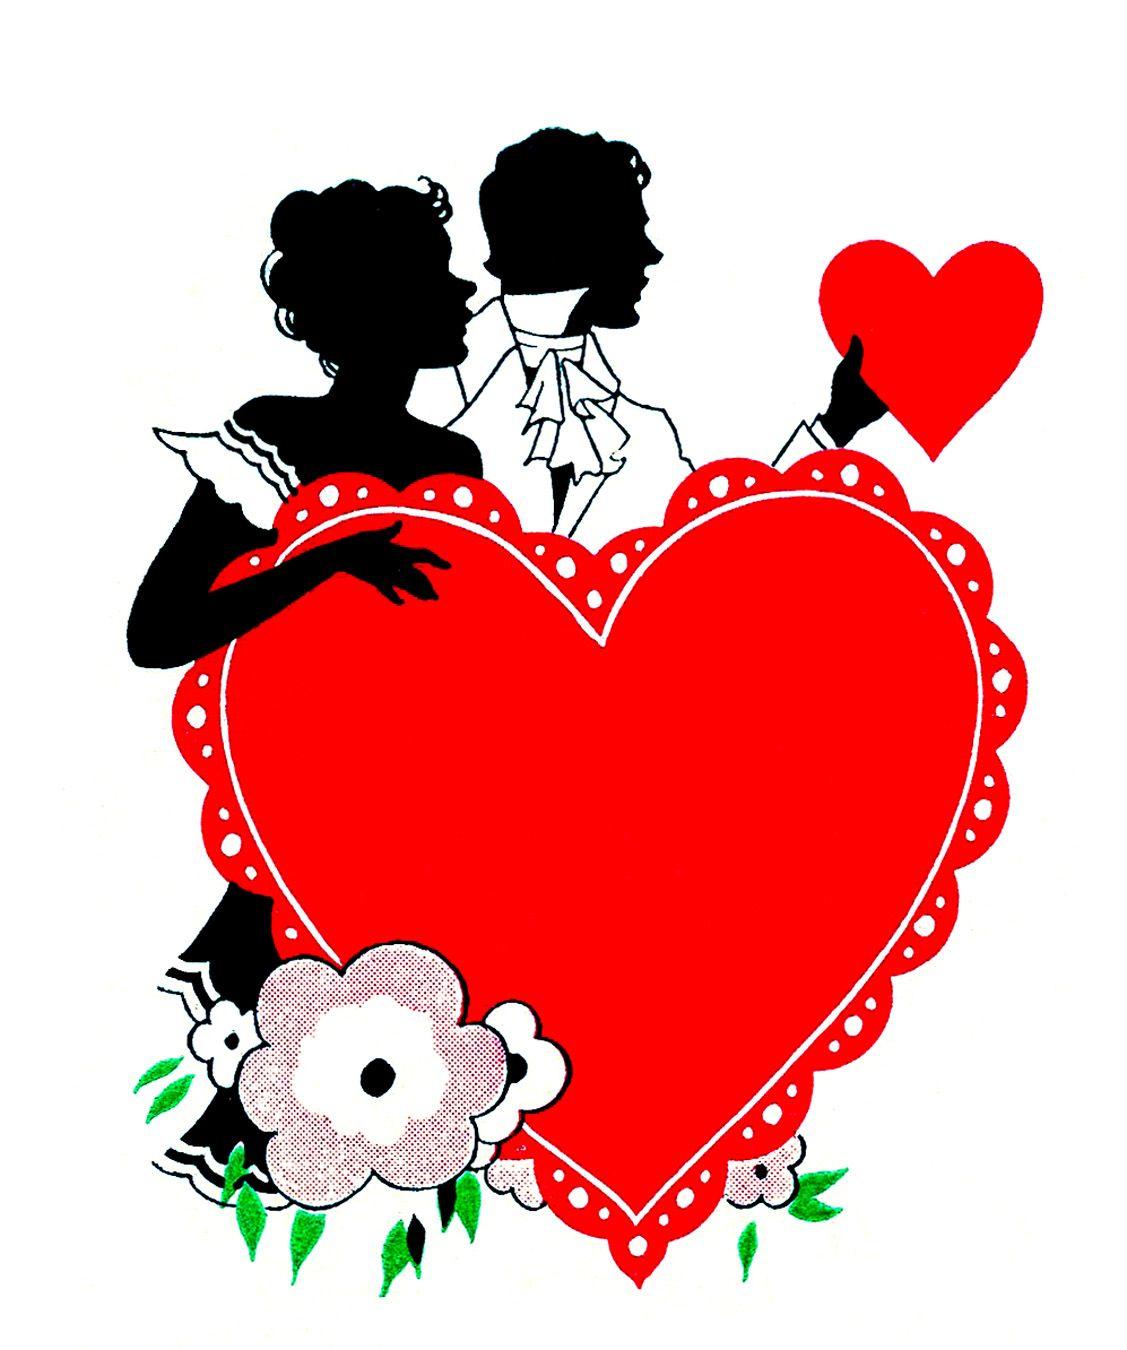 Valentine silhouette clipart jpg transparent library 12 Vintage Valentine Silhouettes! | Valentines Day | Vintage ... jpg transparent library